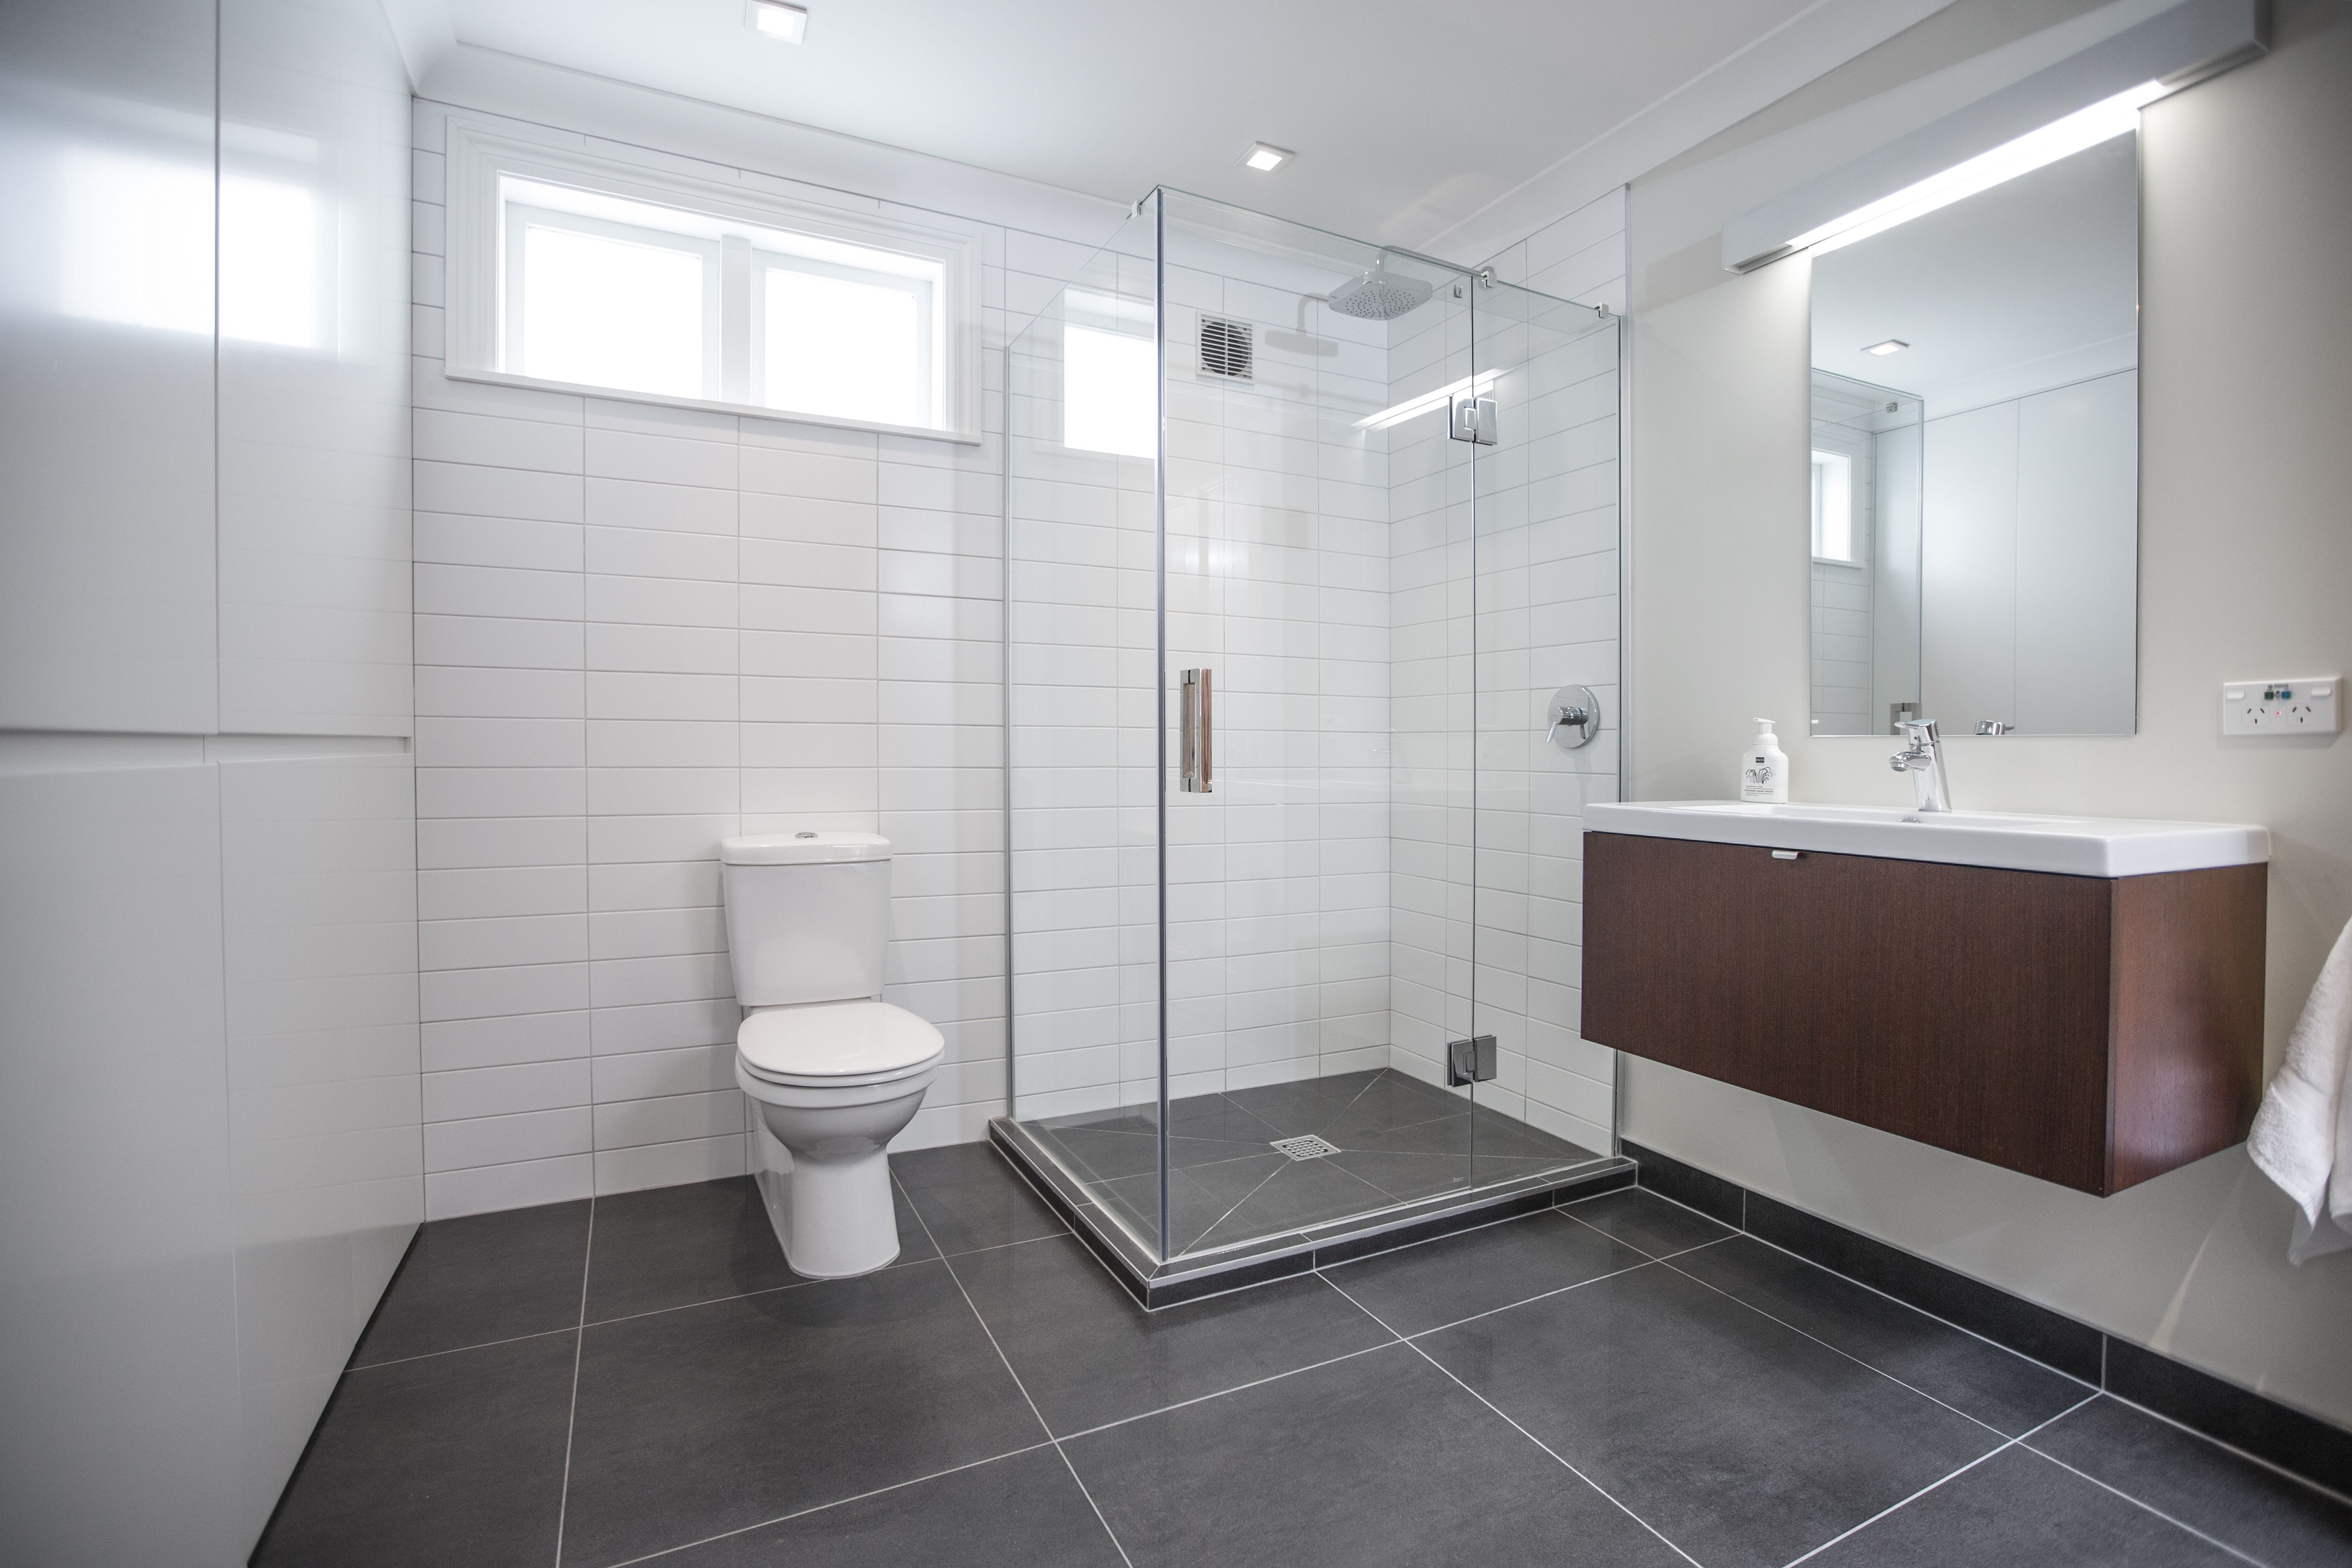 Bathroom 503 Sally Steer Design Wellington New Zealand Bathroomdesignwellingtonnewzeal Bathroom Design Bathroom Design Inspiration Bathroom Vanity Remodel